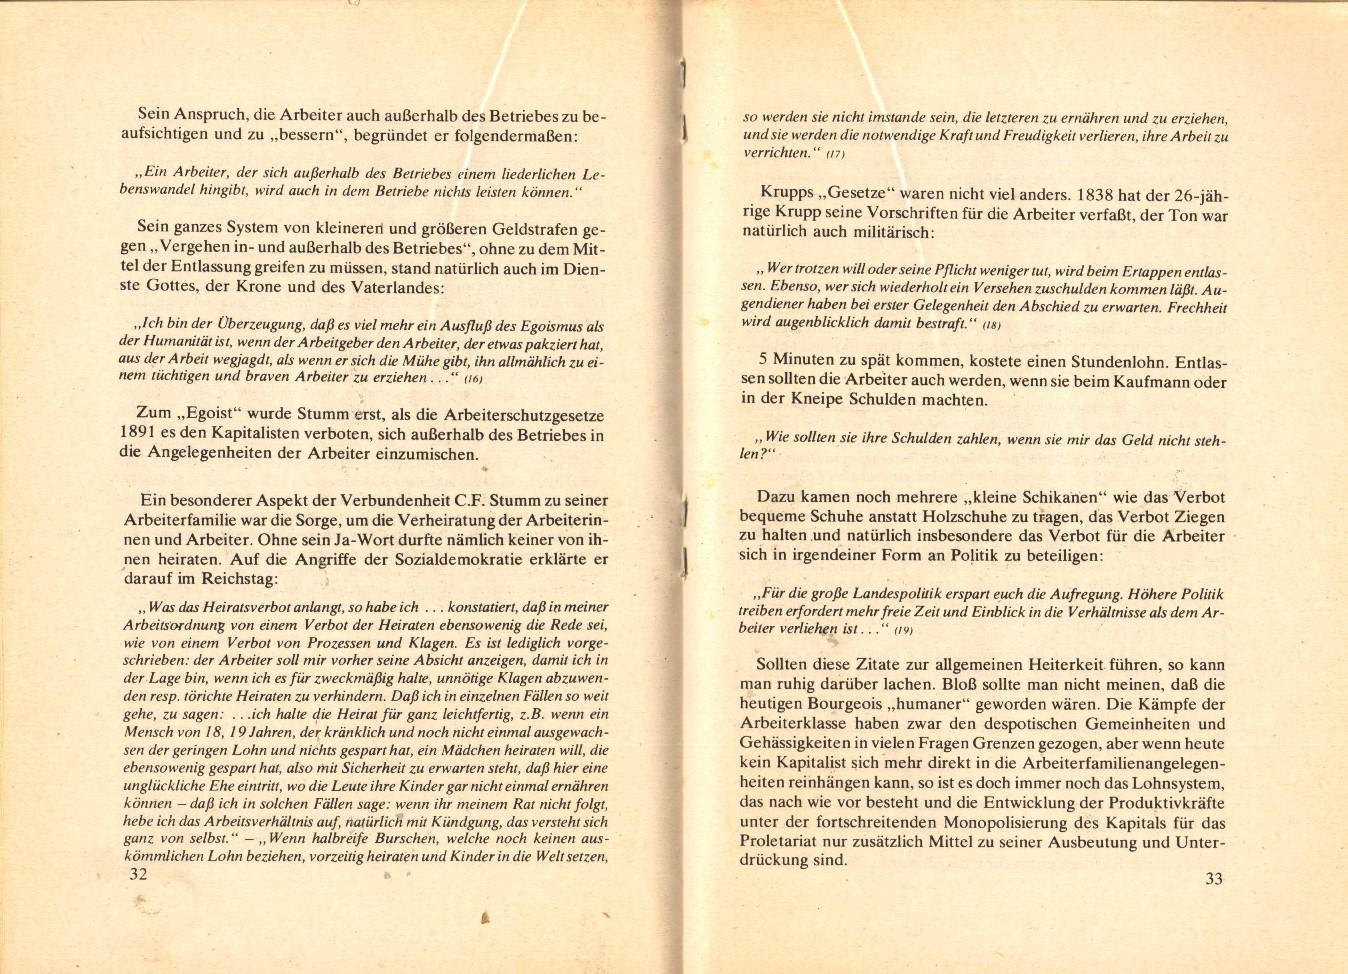 NRW_KBW_1977_Politik_der_Kohle_u_Stahlbarone_18